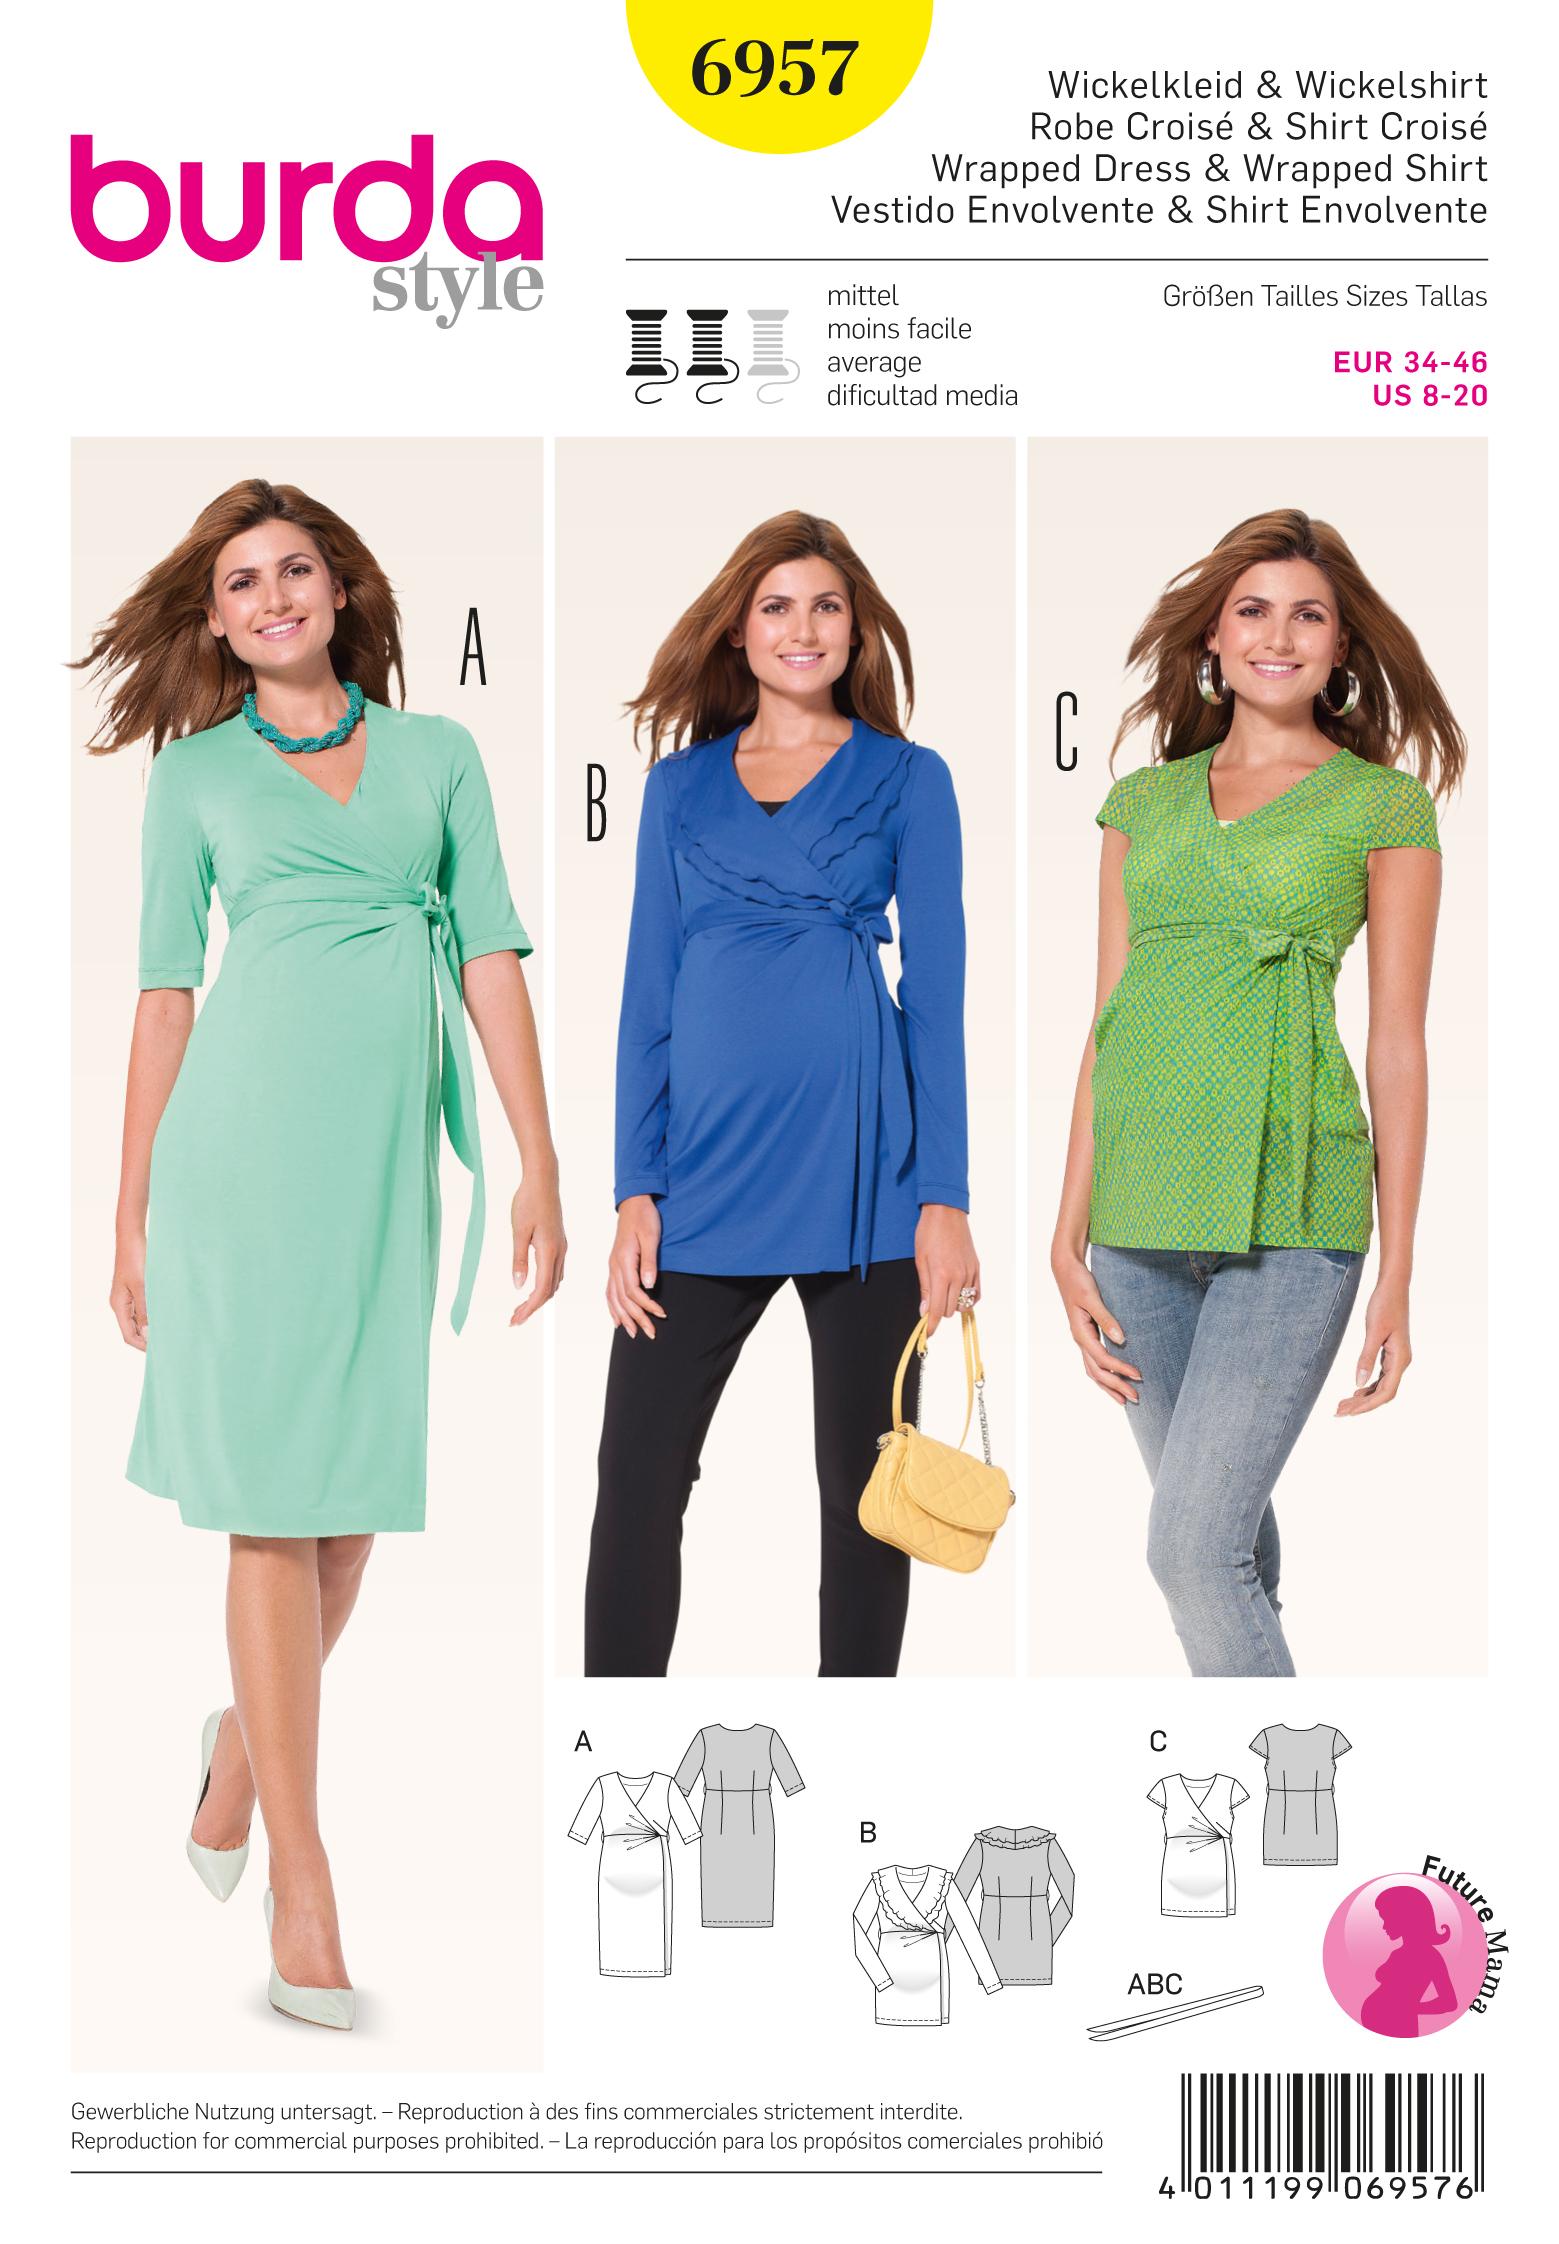 Burda Maternity Wear 6957